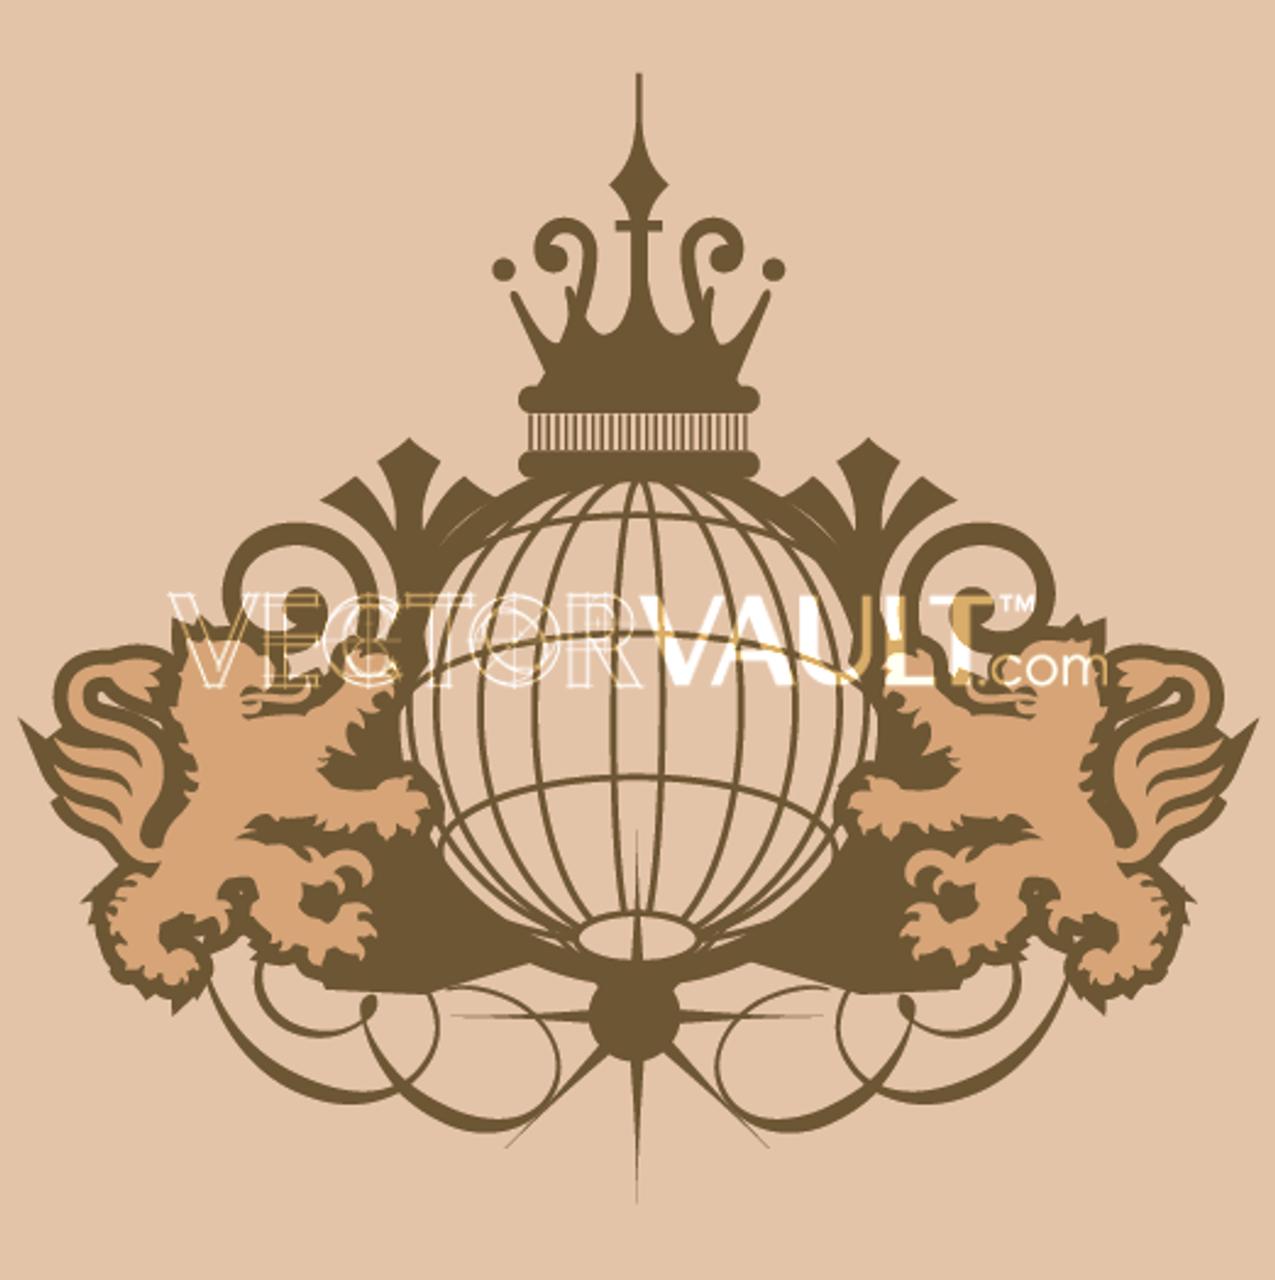 buy vector globe emblem royal icon logo graphic royalty-free vectors  buy vector art - vectorvault